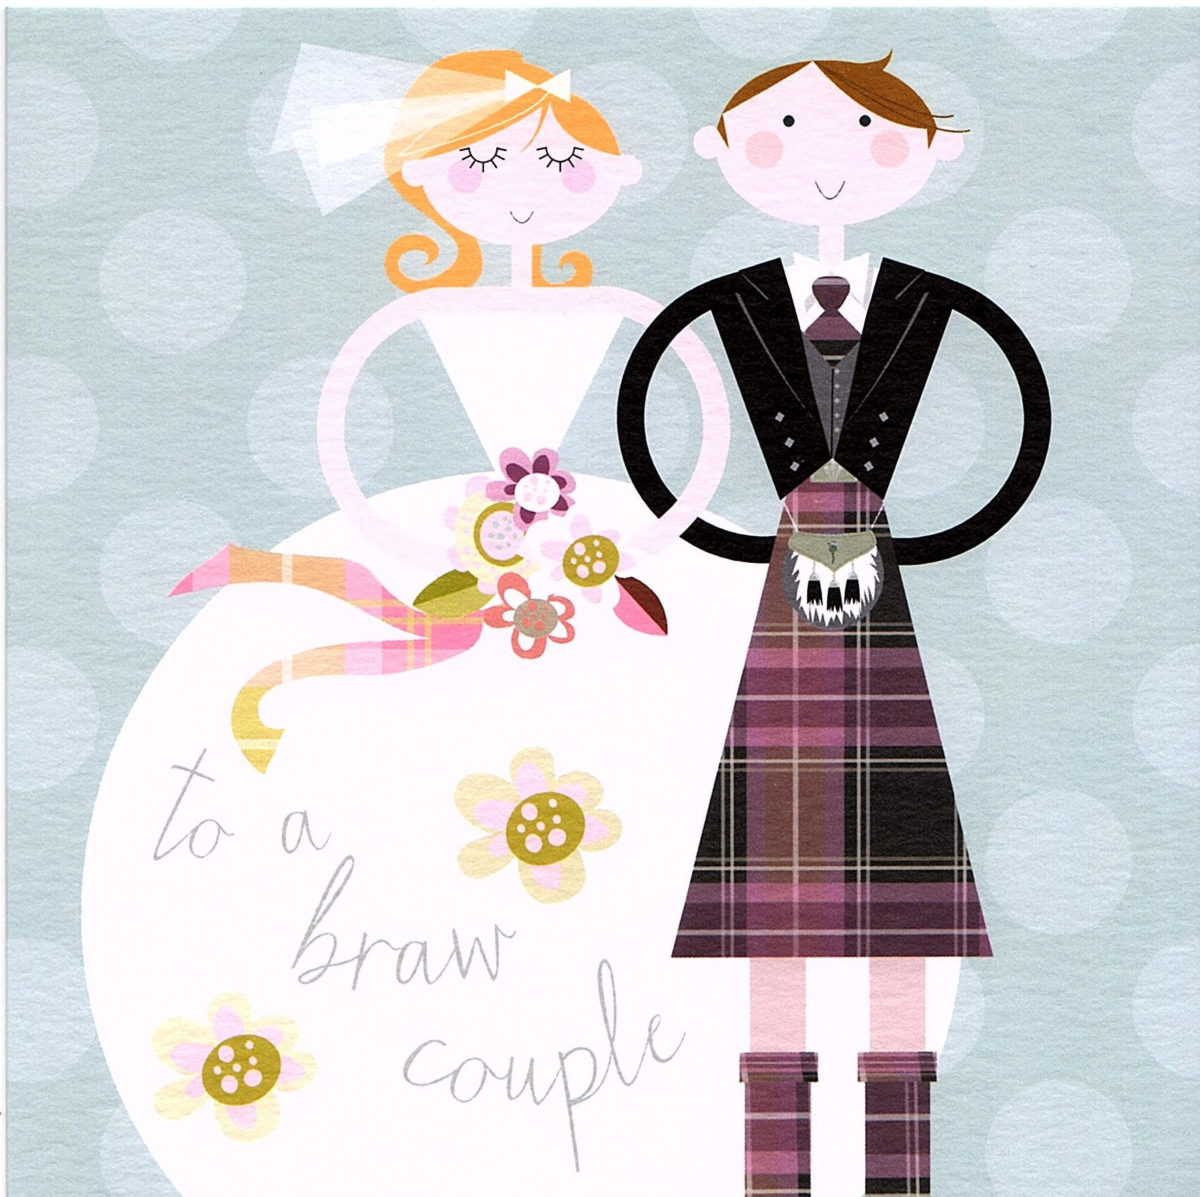 Braw Bride & Groom